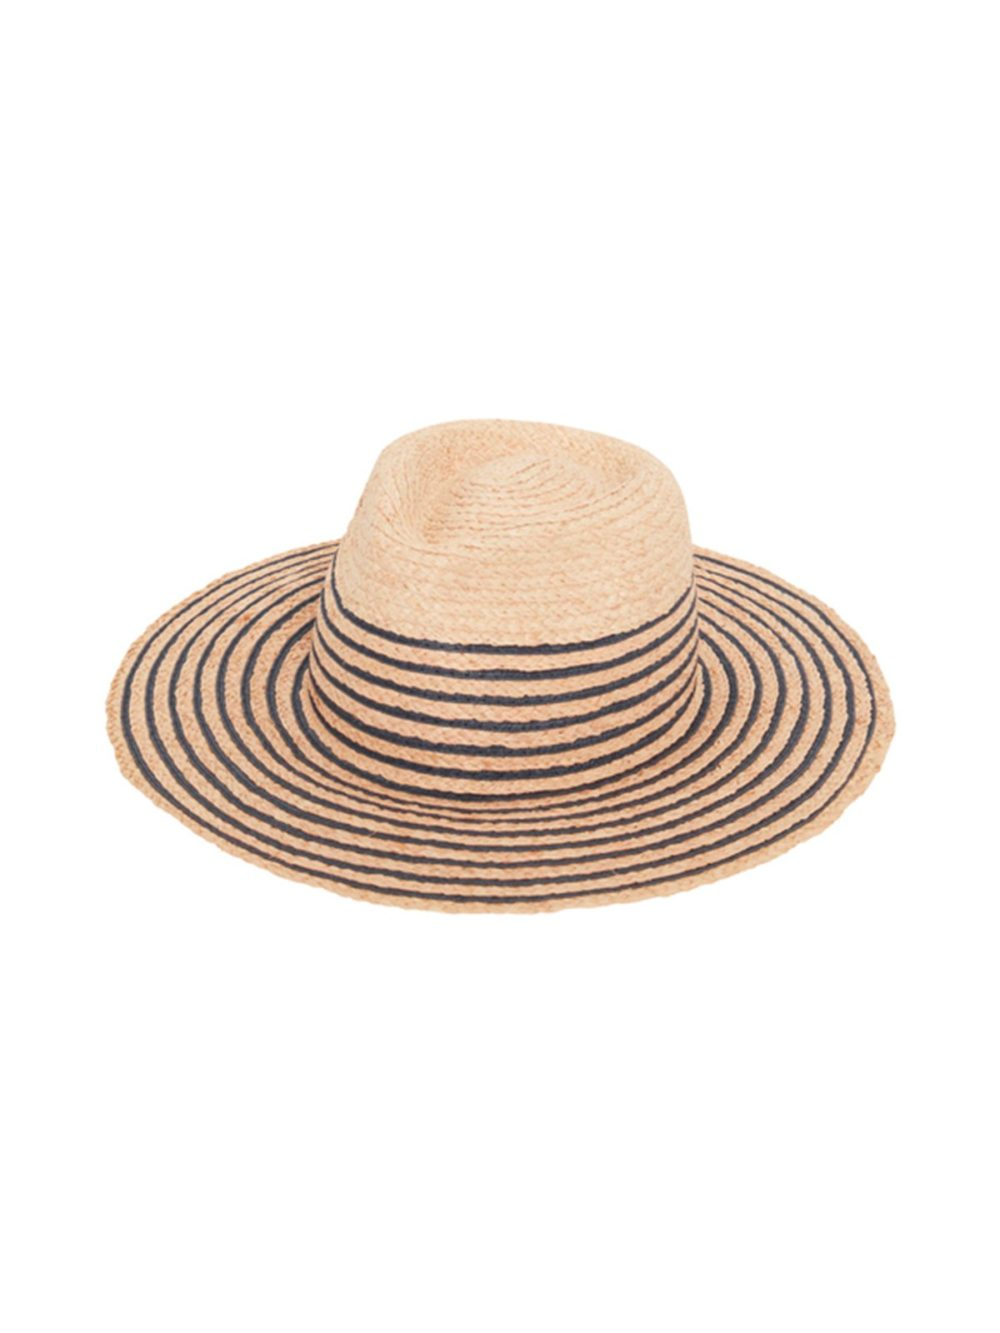 Holly Hat ICHI Katie Kerr Women's Clothing